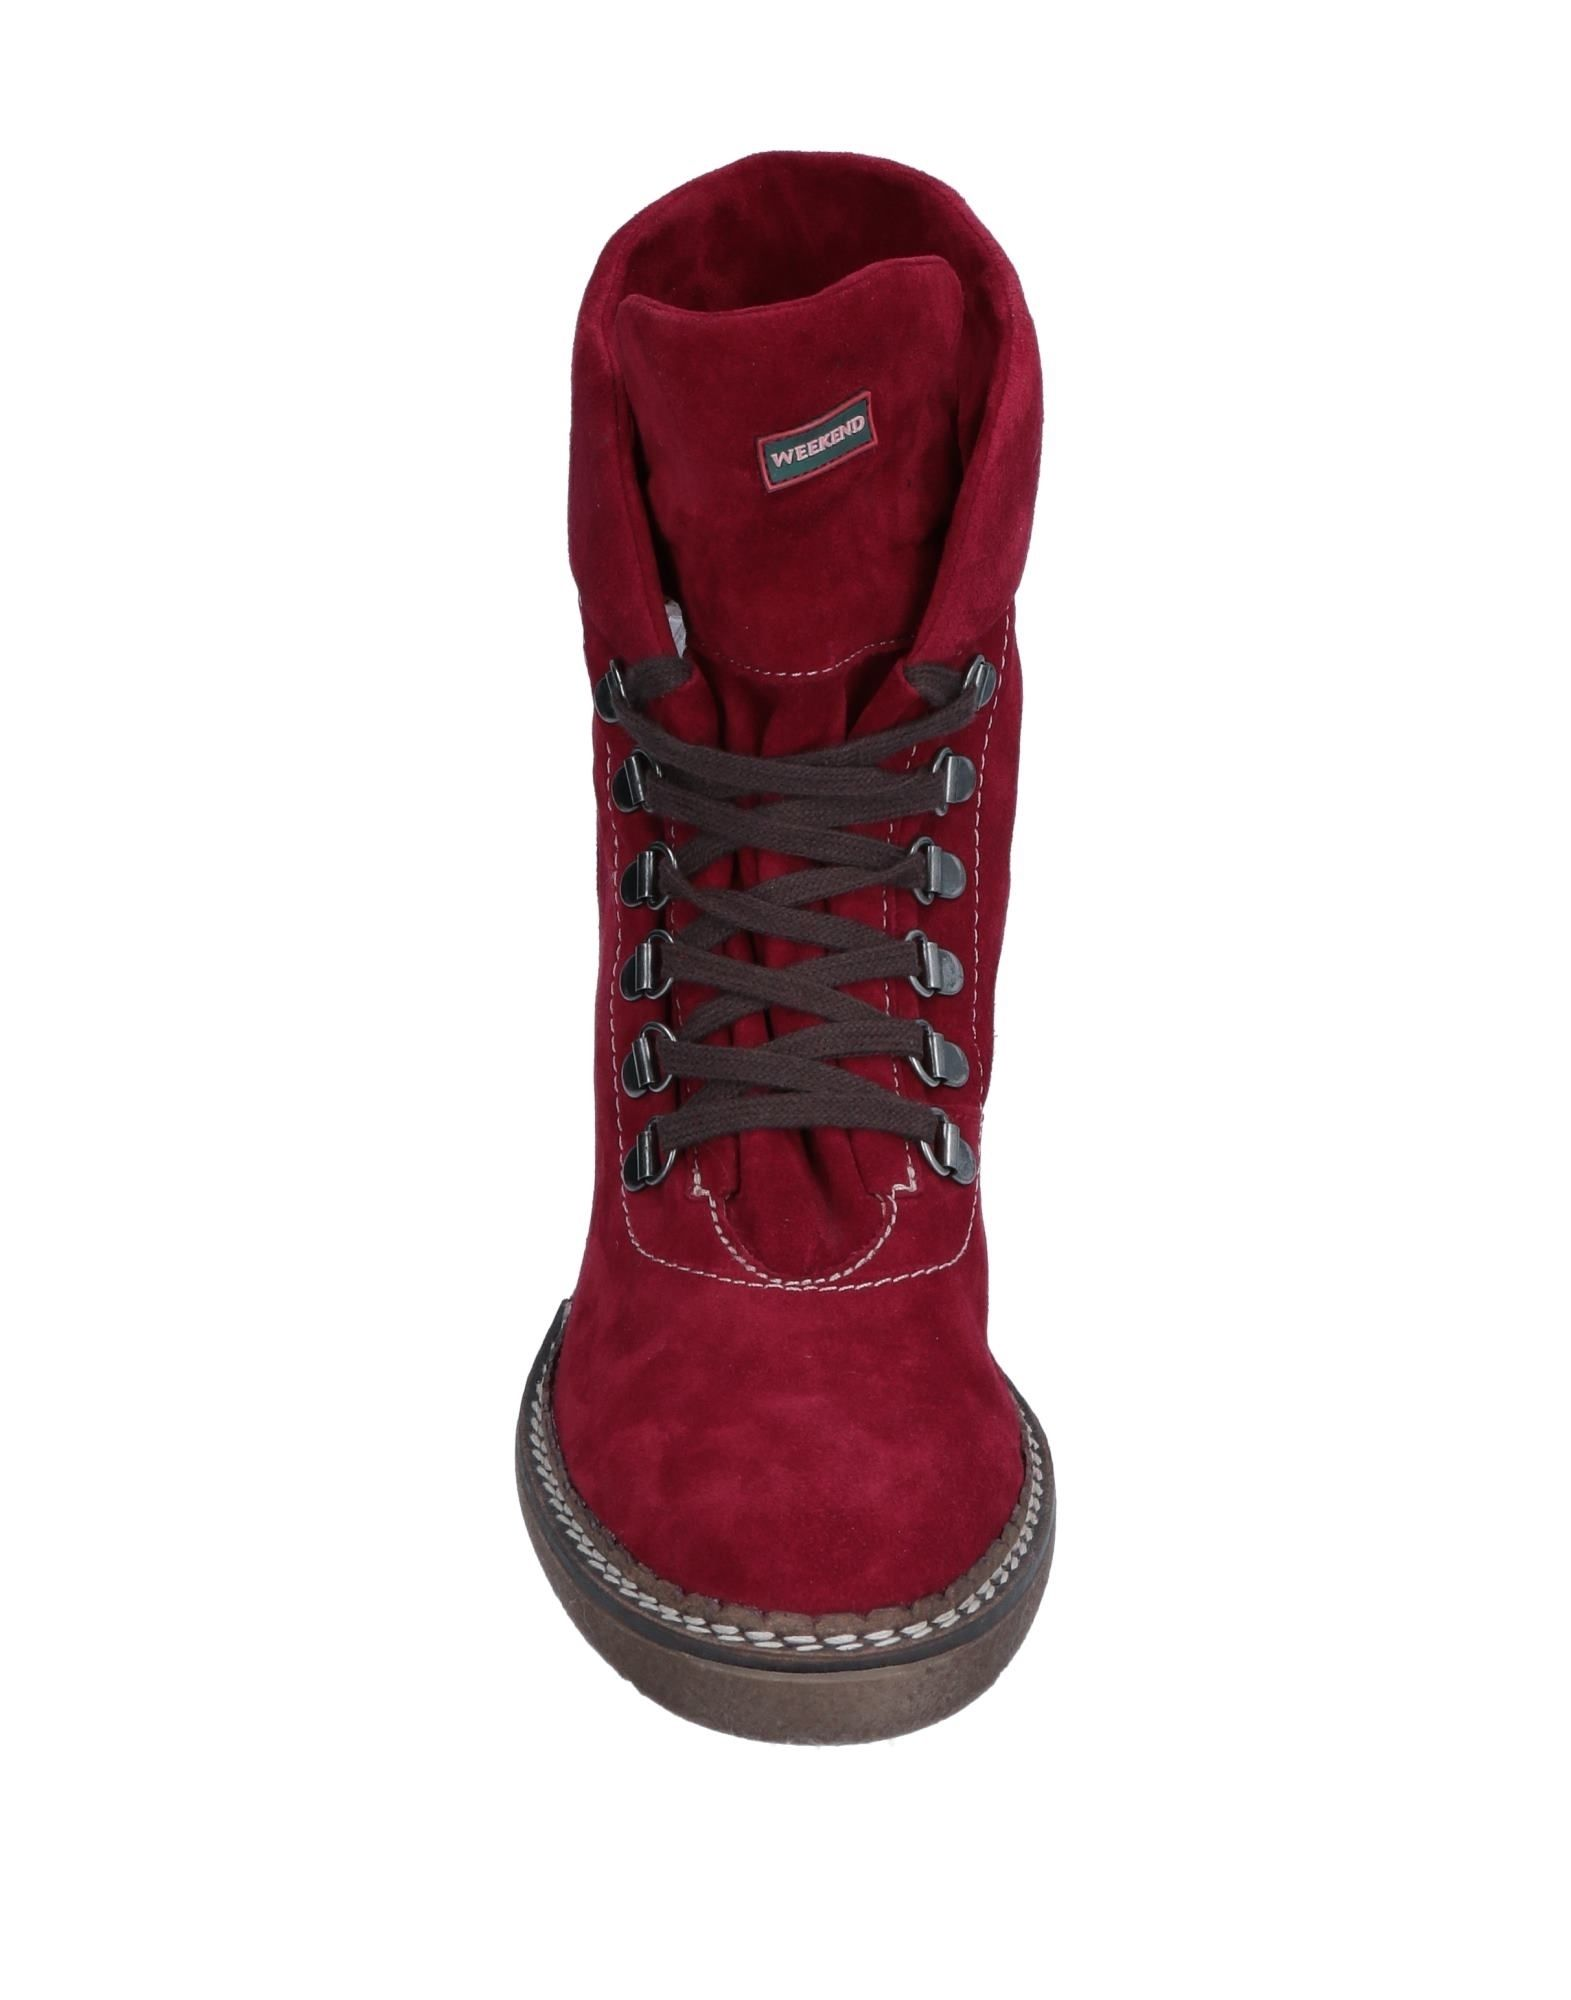 Weekend By Gute Pedro Miralles Stiefelette Damen  11547159FH Gute By Qualität beliebte Schuhe 49aa7d